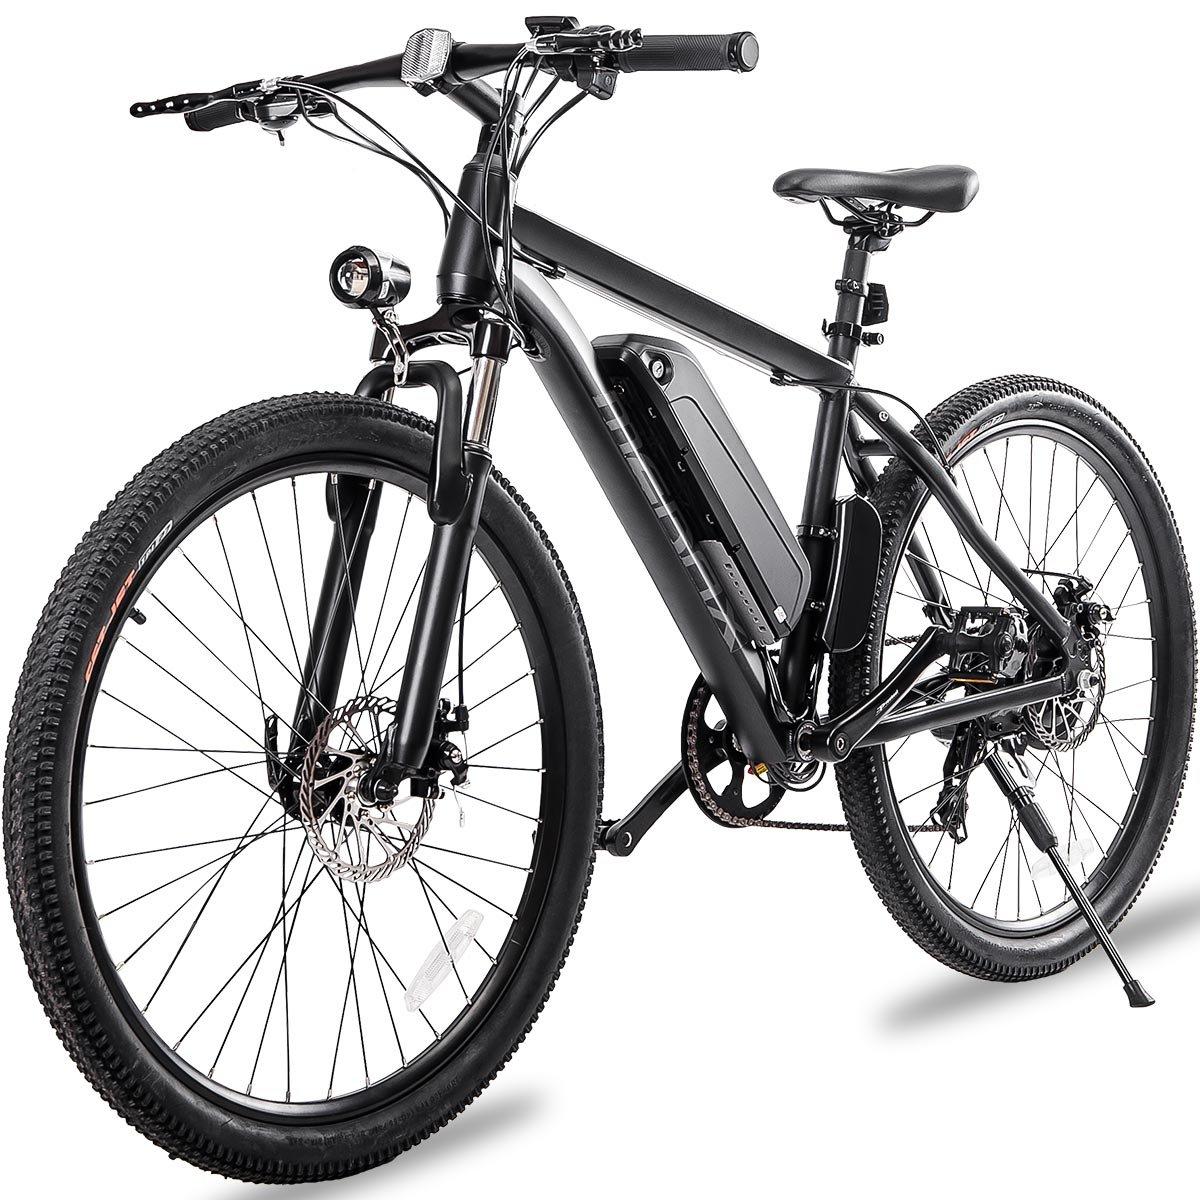 Merax  Electric Bike for heavy riders